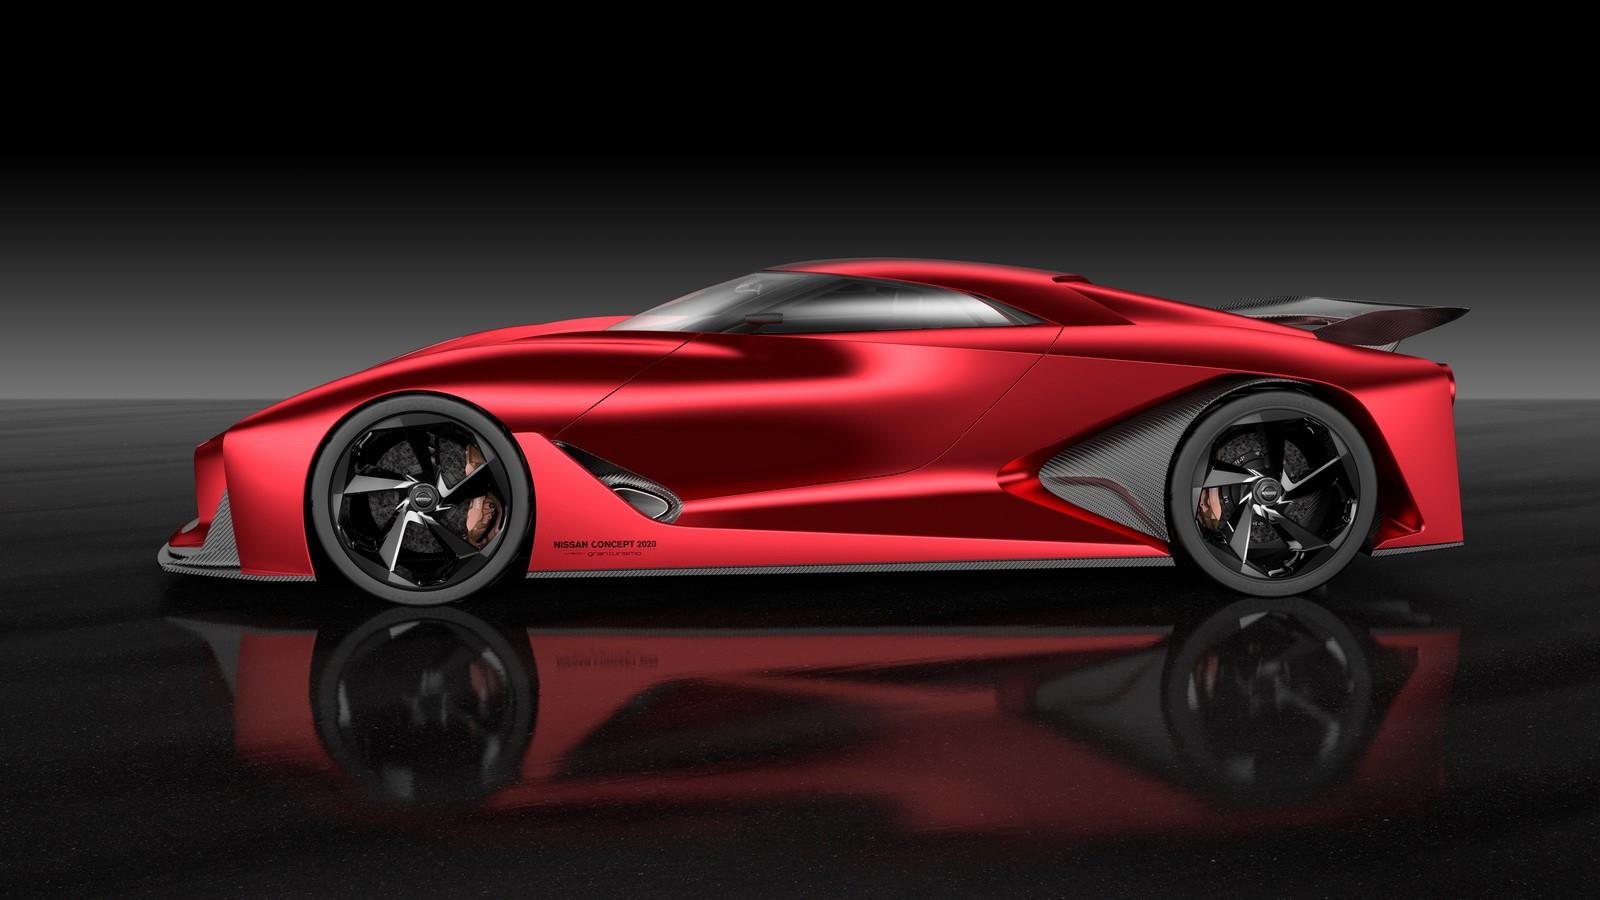 2020 Nissan Vision Gran Turismo Concept Supercar Photo